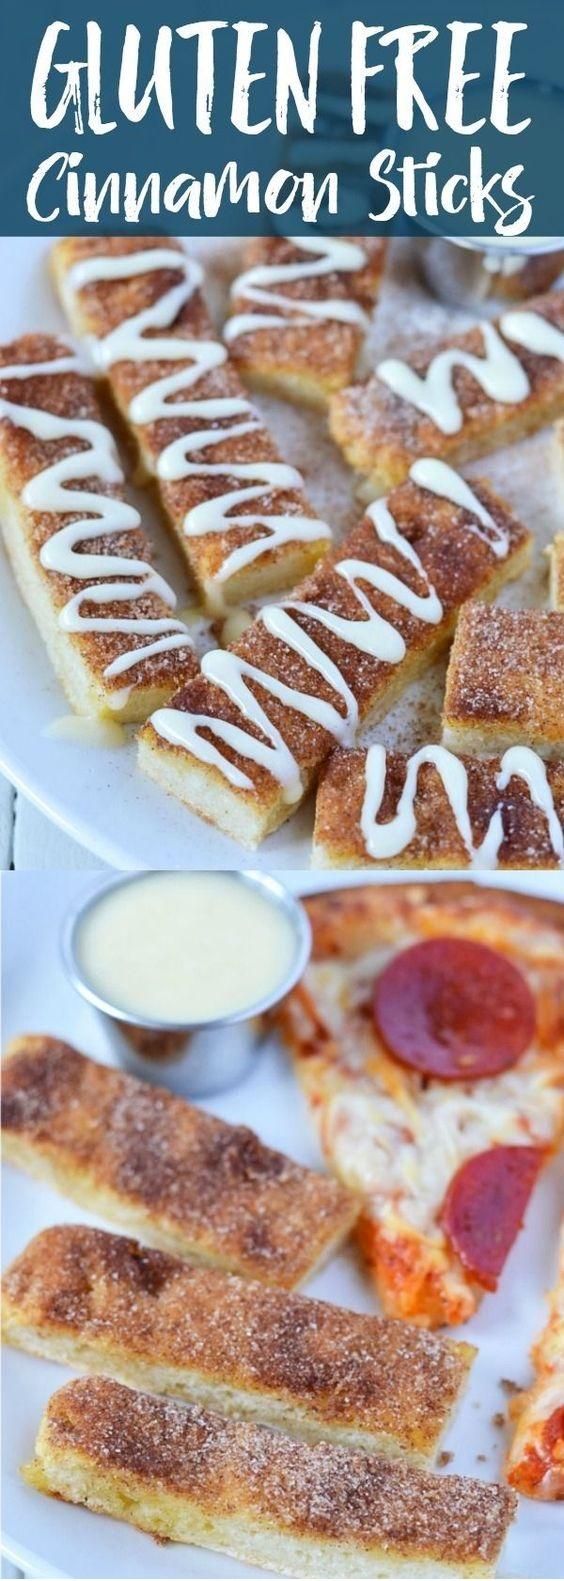 Gluten Free Cinnamon Sticks